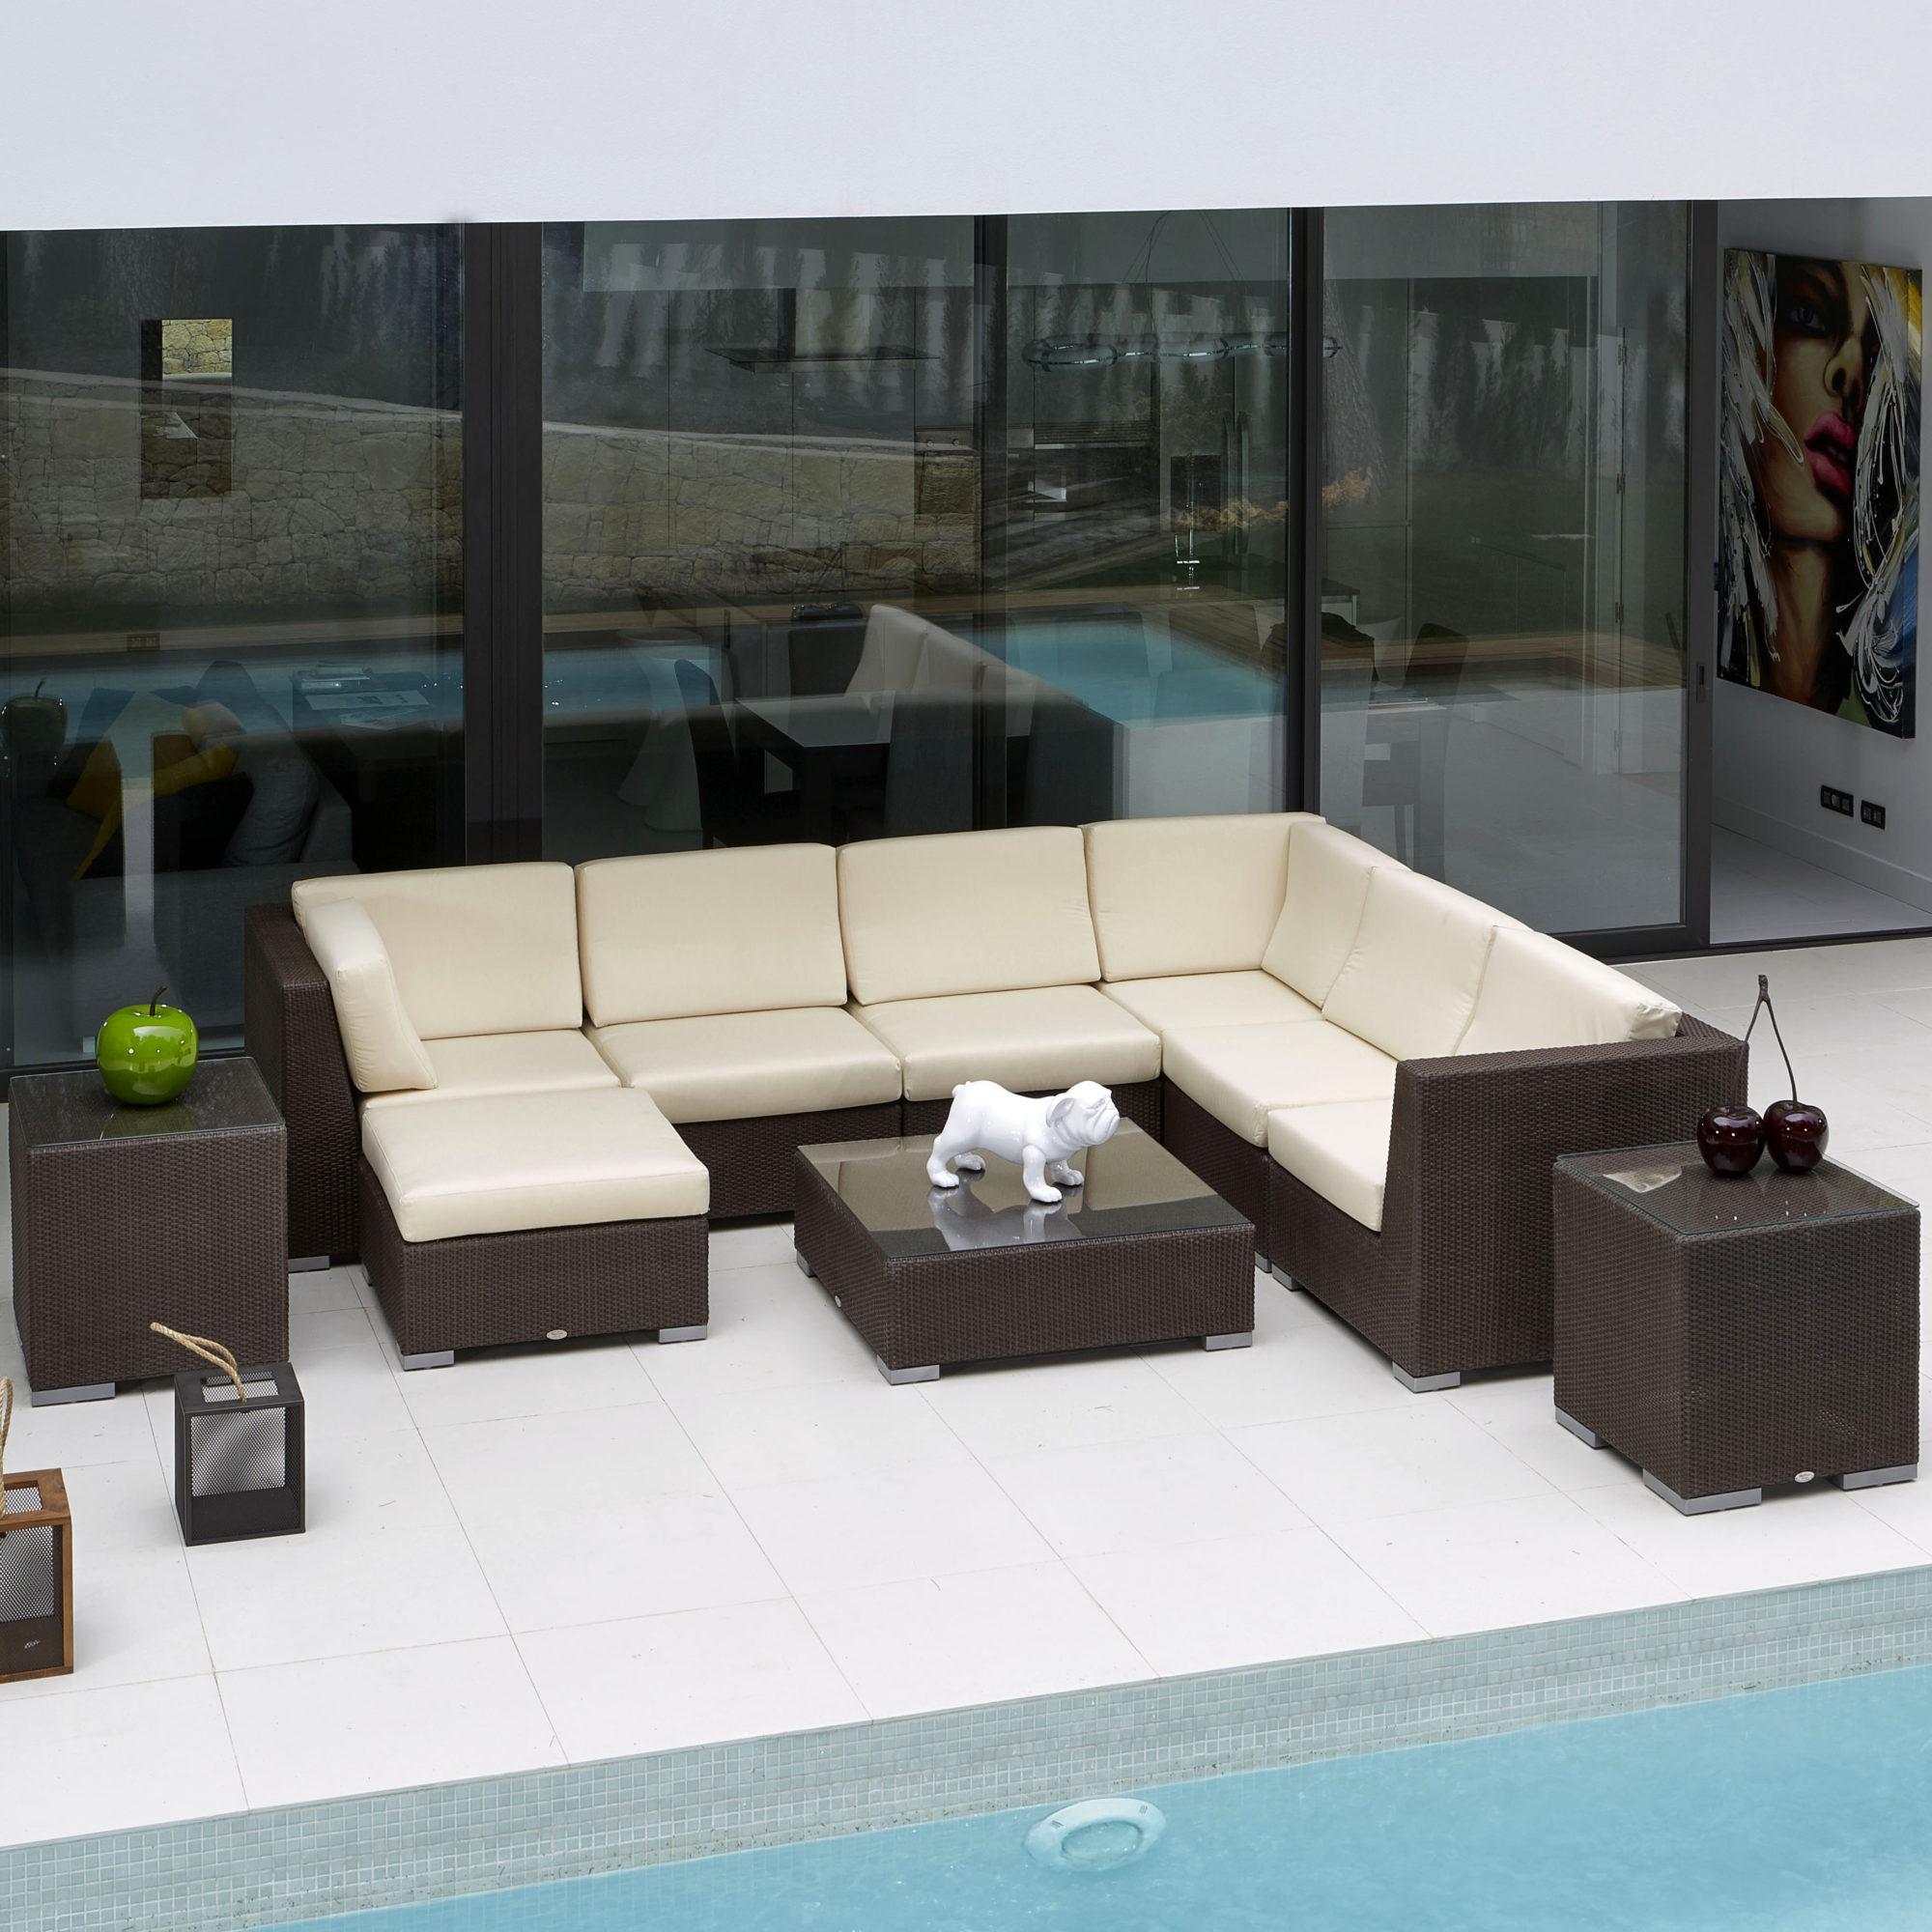 Skyline Pacific Modular Sofa Couture Outdoor